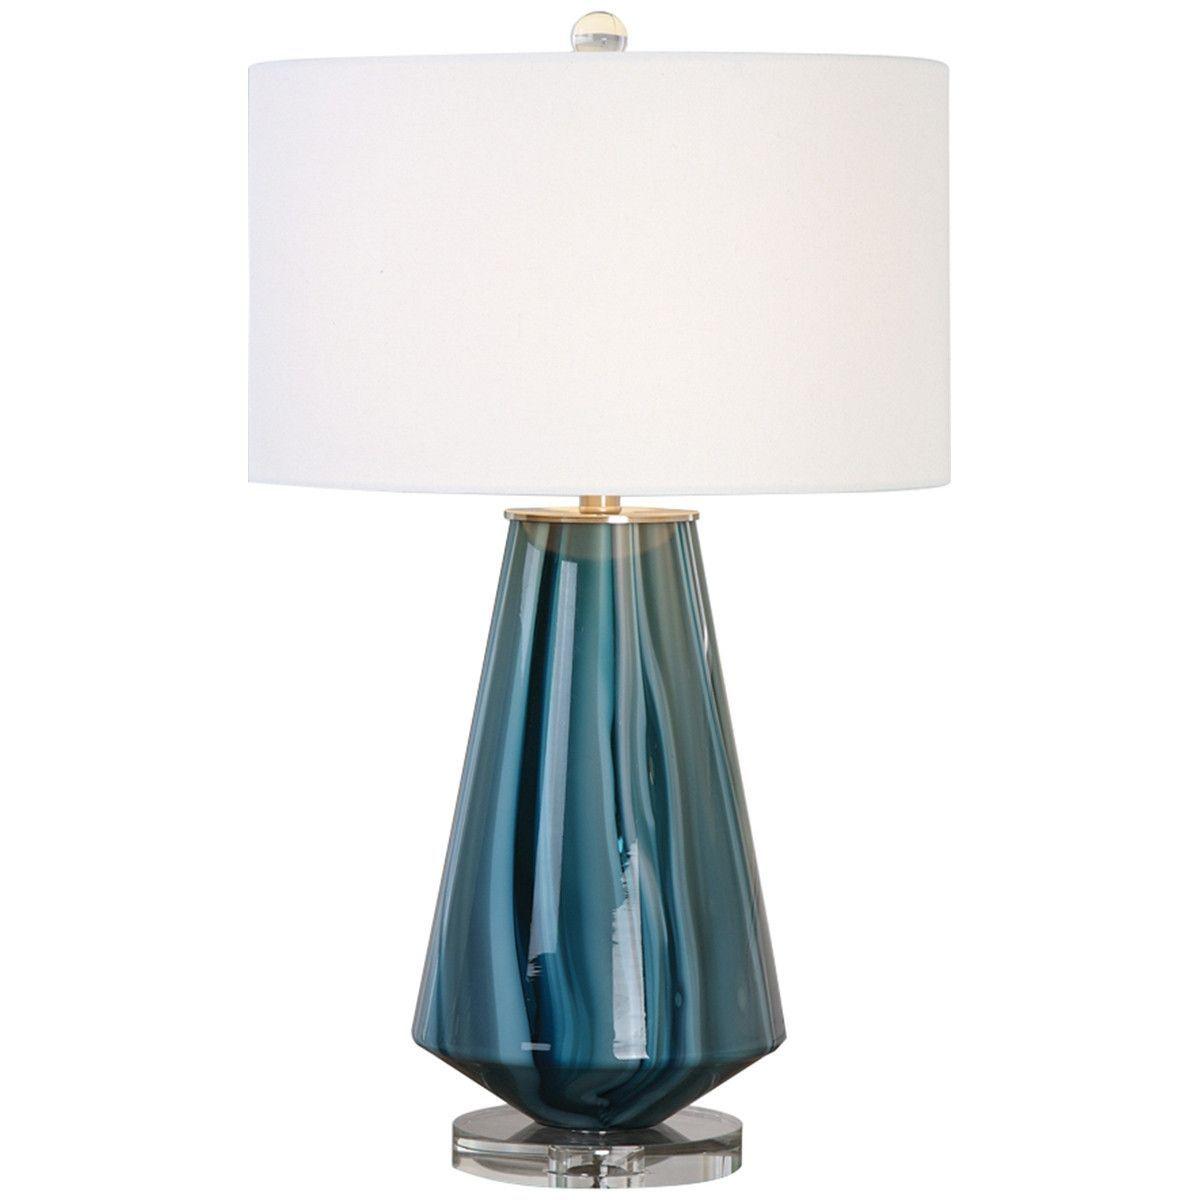 Uttermost Pescara Table Lamp